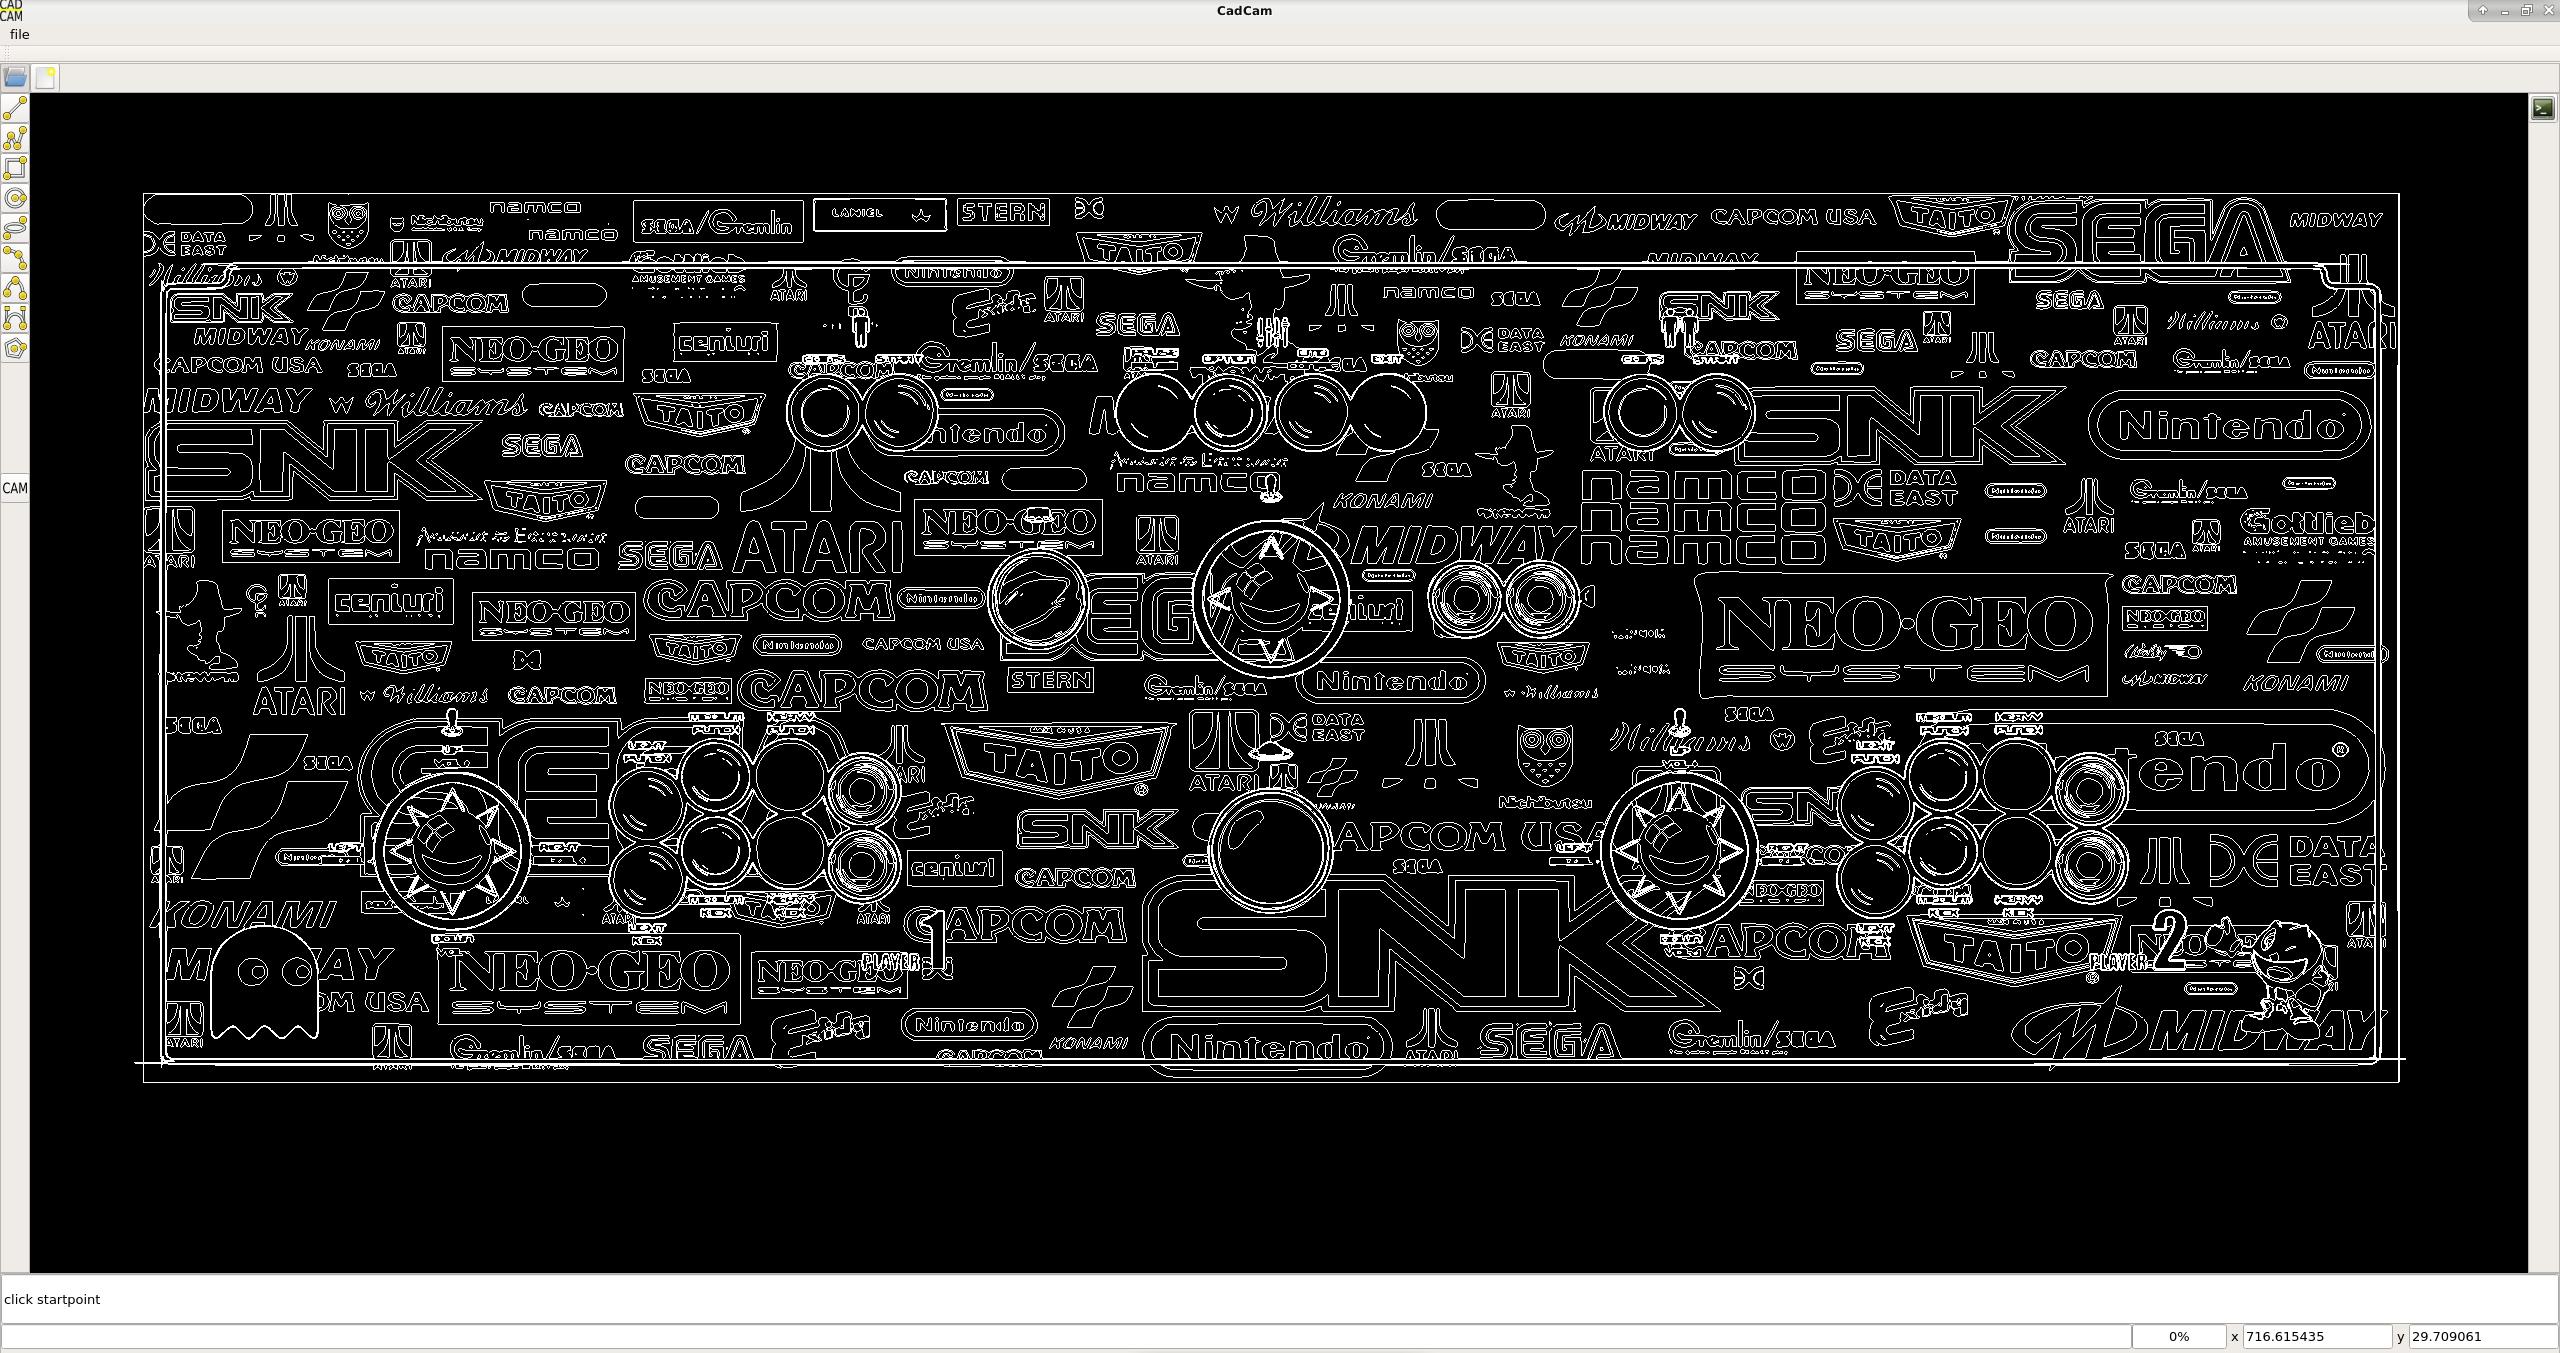 control_panel_find_contours_empty.png